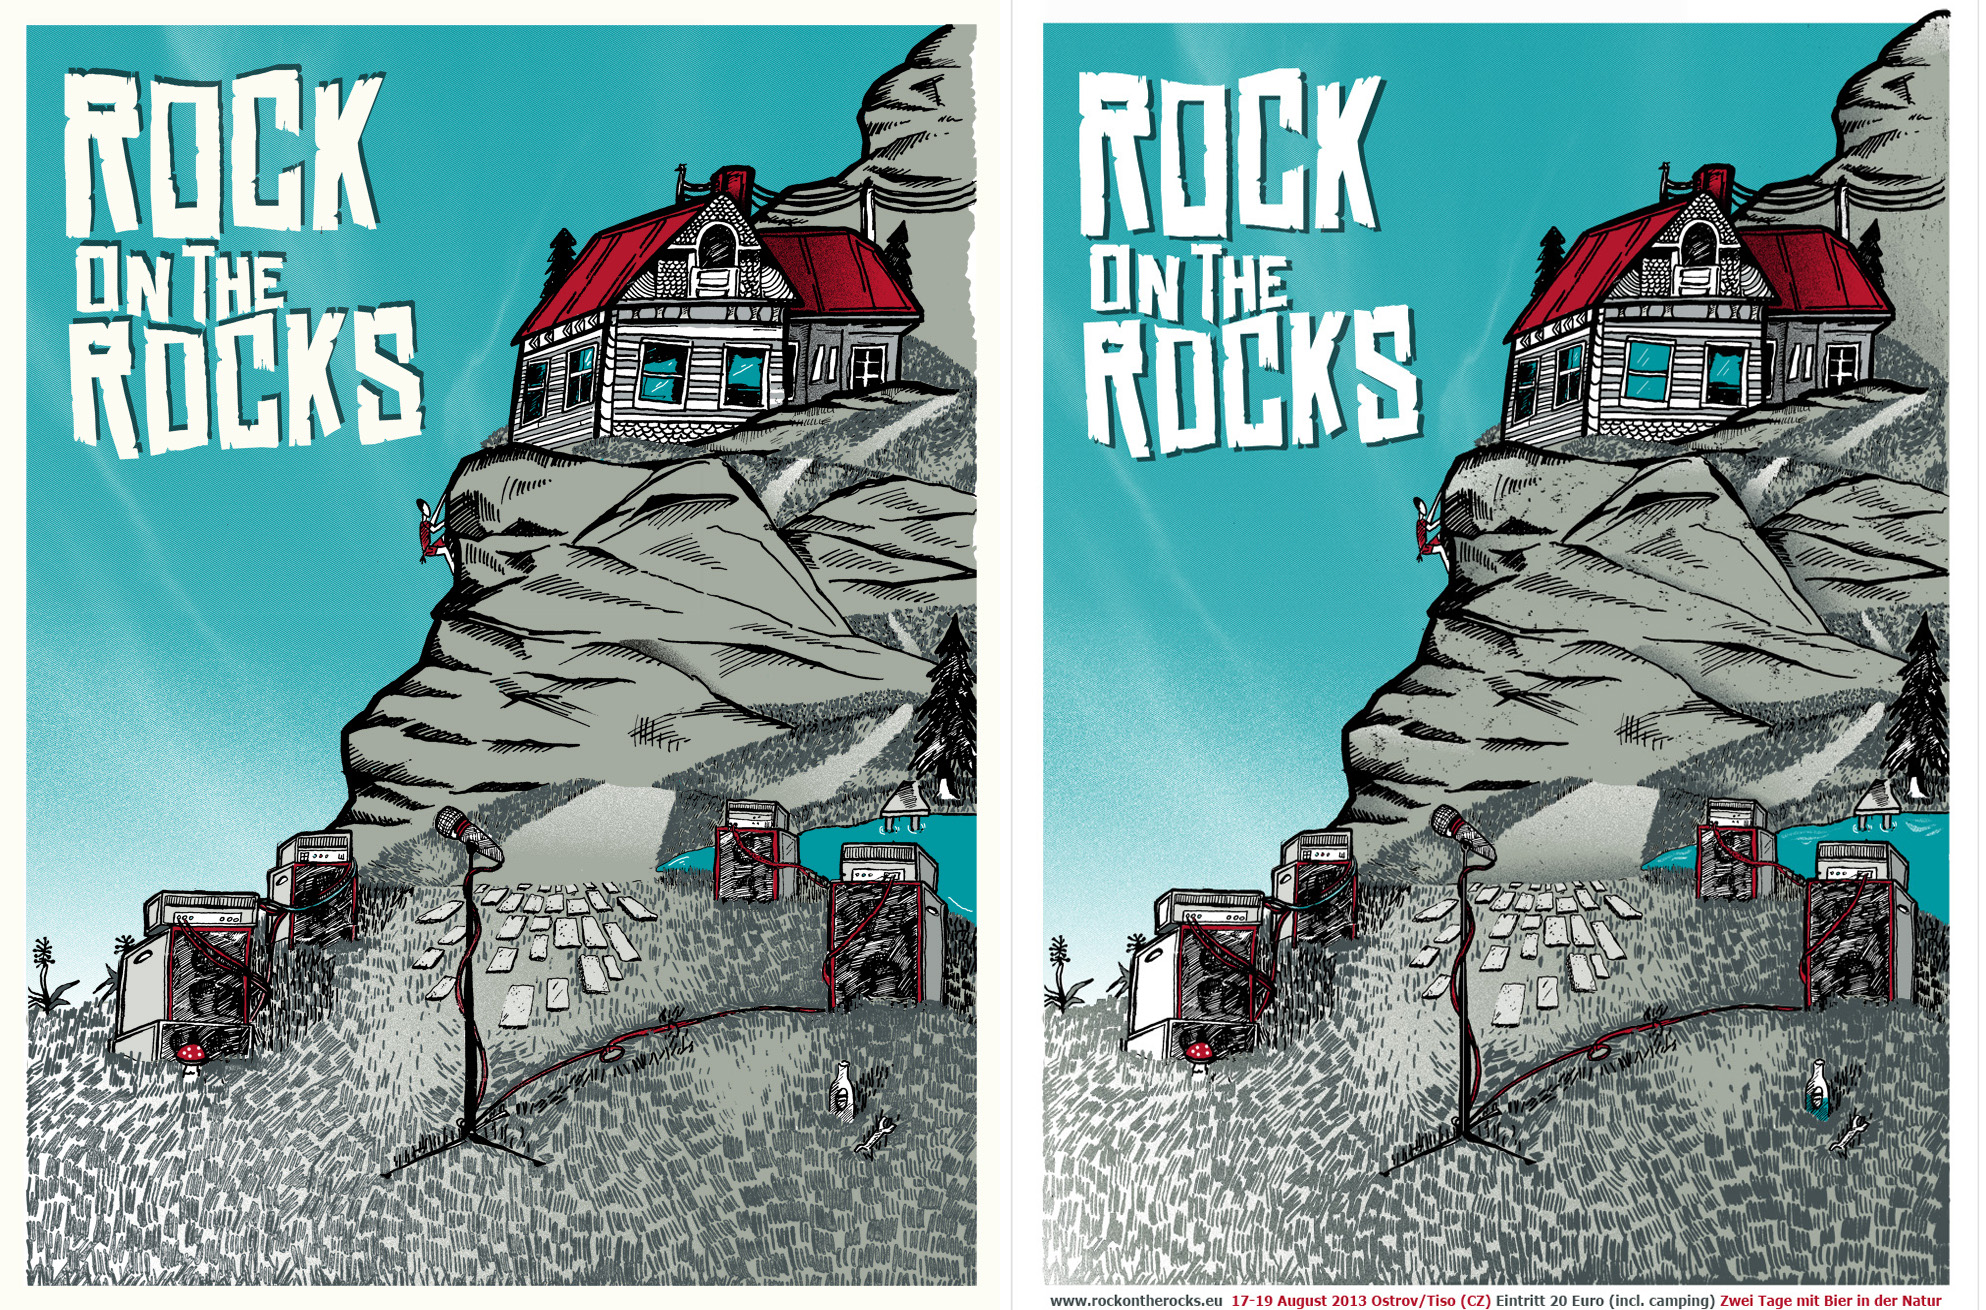 3/23 Silk scrren print: Rock on the Rocks Festival - image 13 - student project